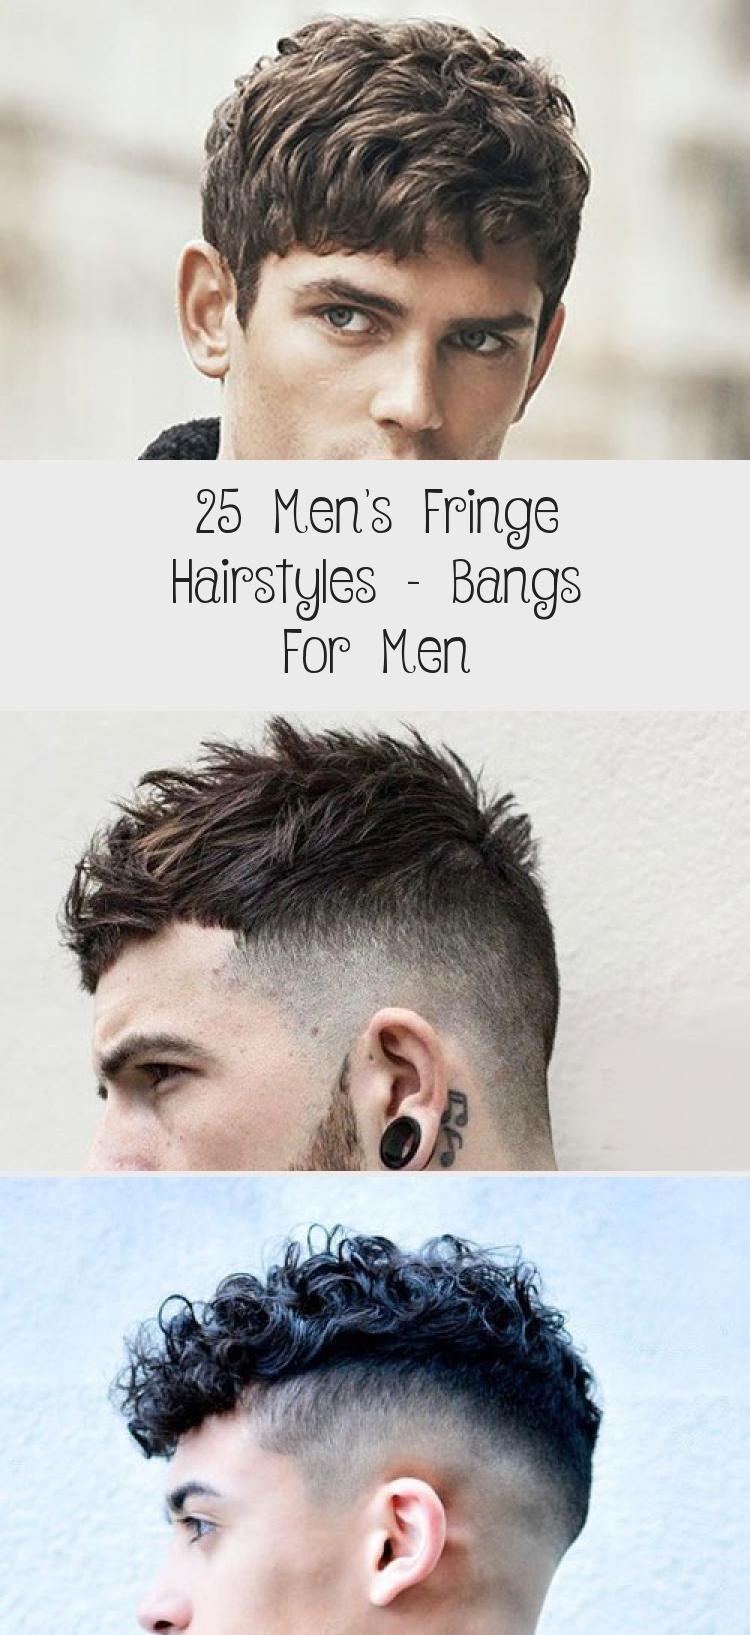 25 Herenkapsels Voor Mannen Pony Voor Mannen Kapsel Fringe Bangs Hairstyles Fringe Hairstyles Hairstyles With Bangs